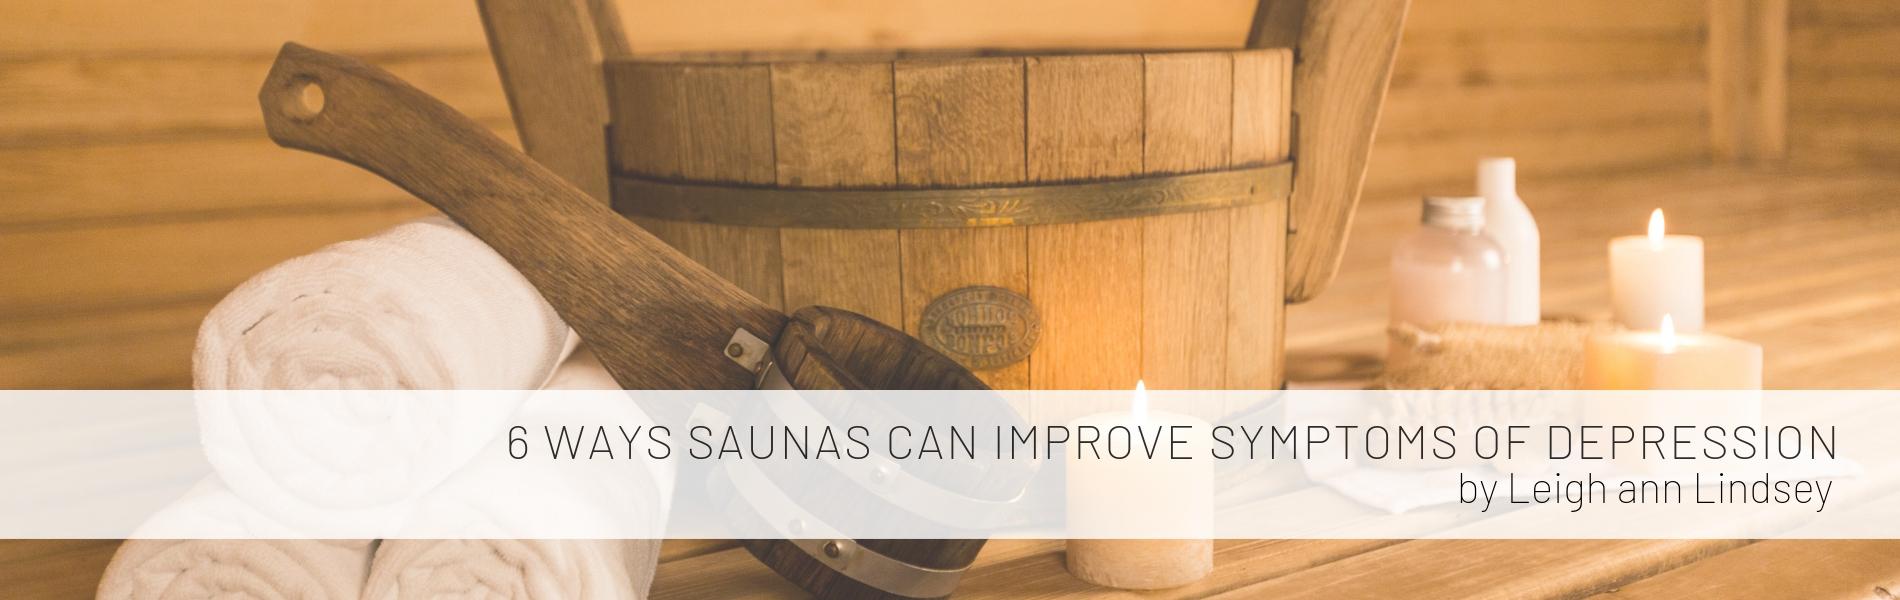 Ways Saunas Can Reduce Symptoms of Depression